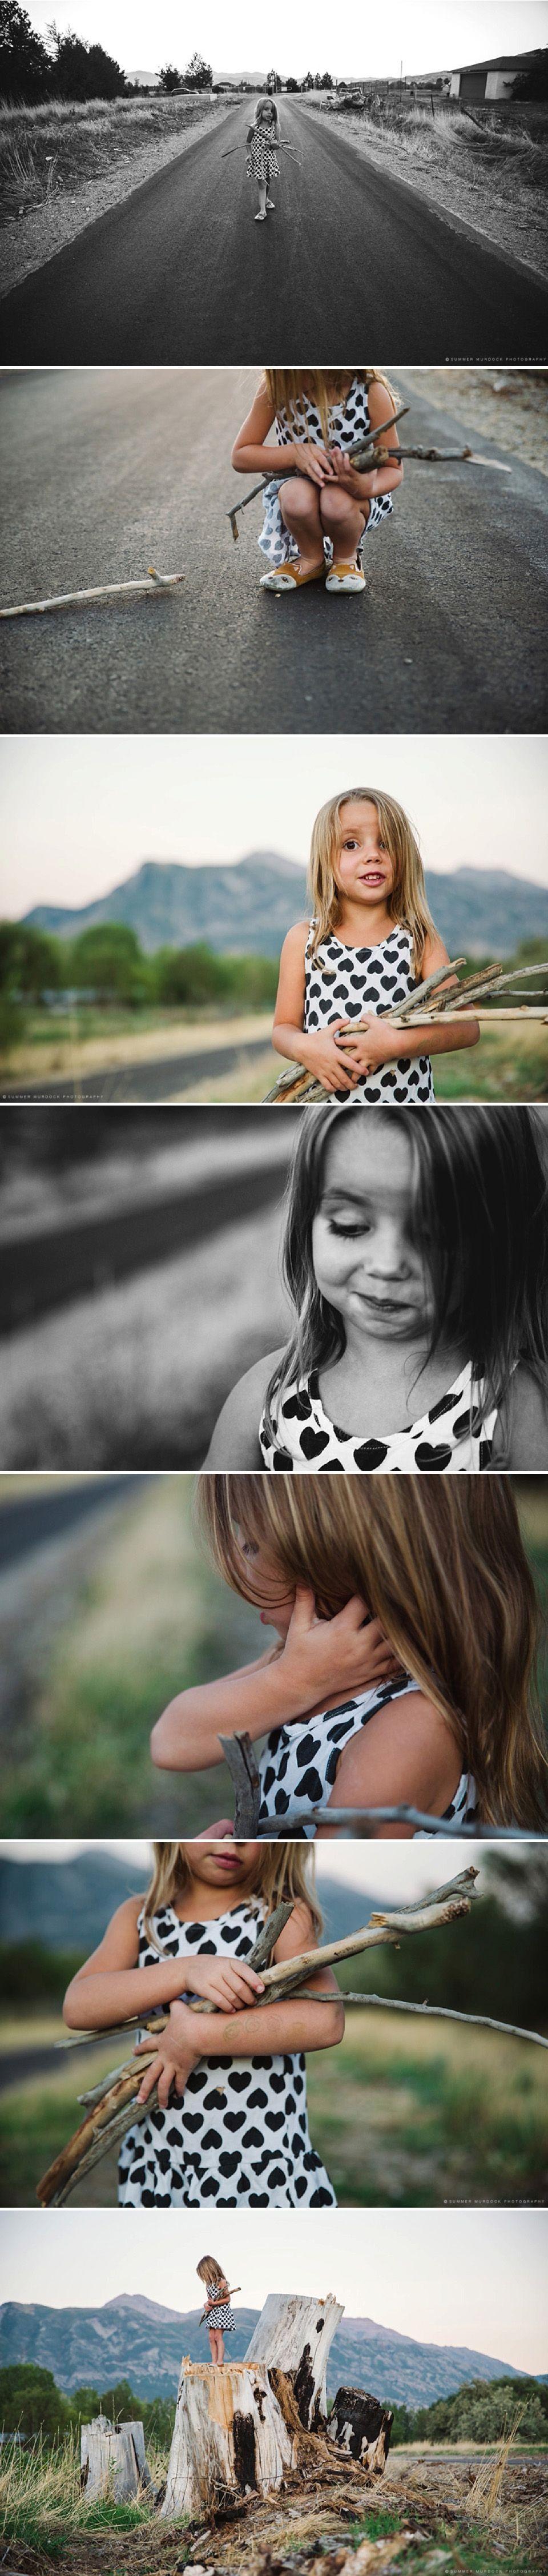 Summer Murdock Photography Salt Lake City Photographer 5 minute project